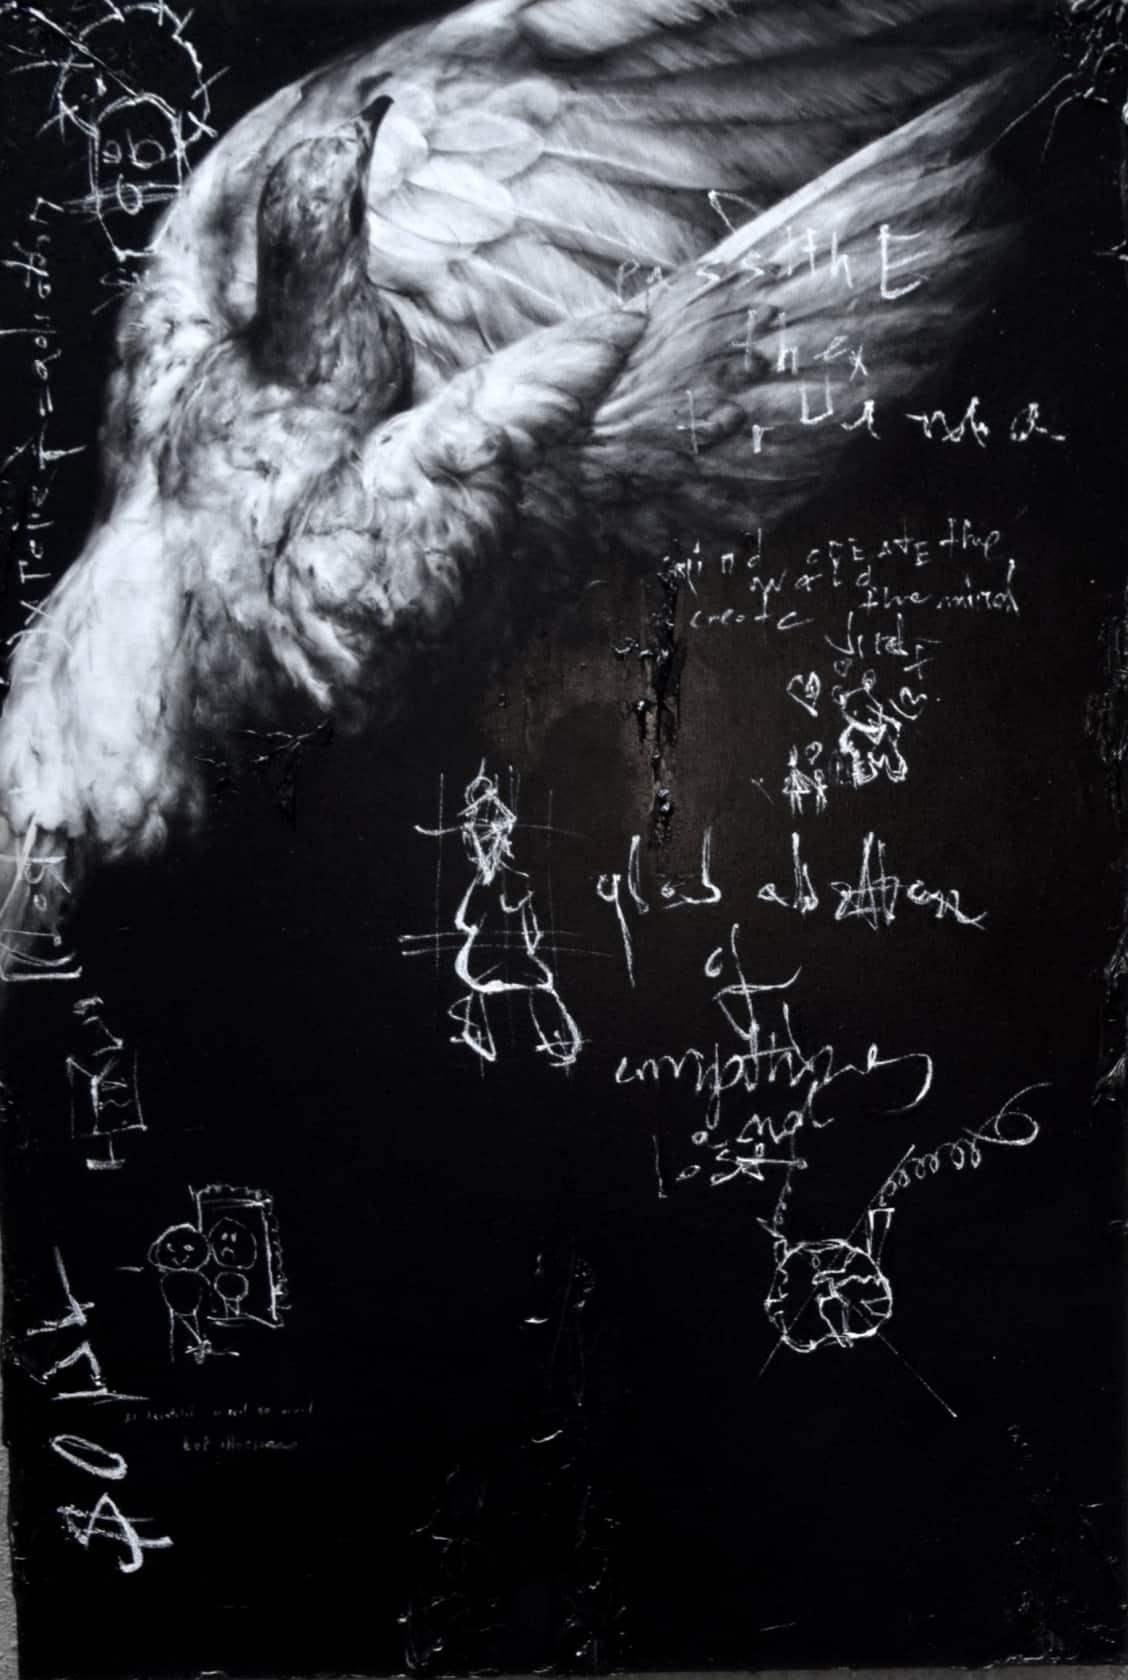 Igor Dobrowolski Pass the Trauma Oil on Canvas